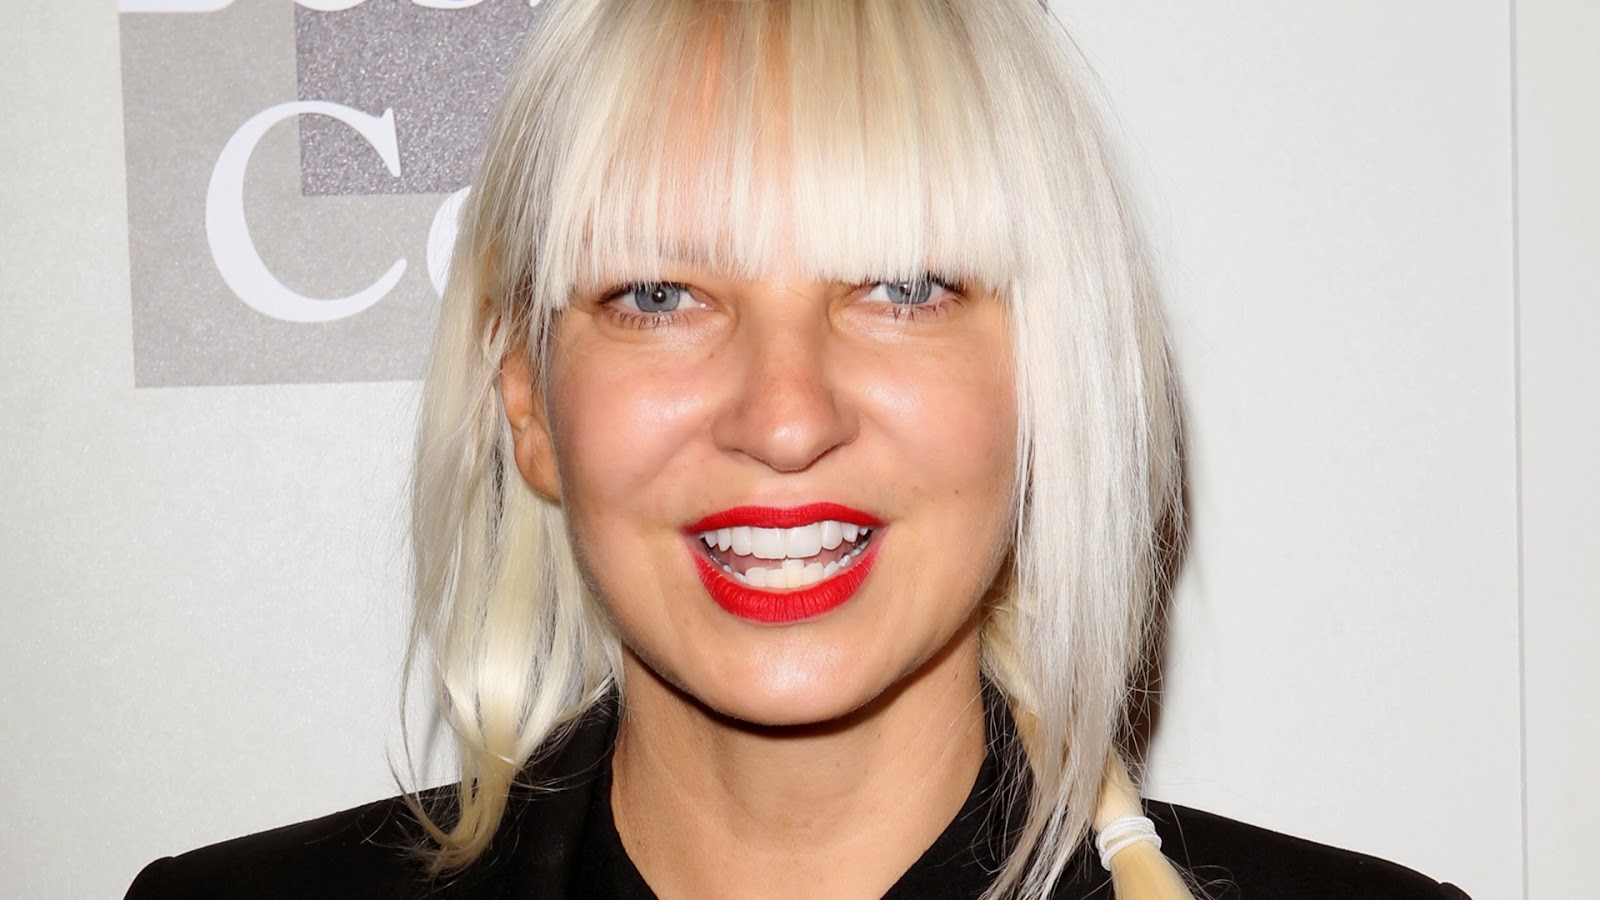 Sia Furler new video Fire Meet Gasoline with Heidi Klum